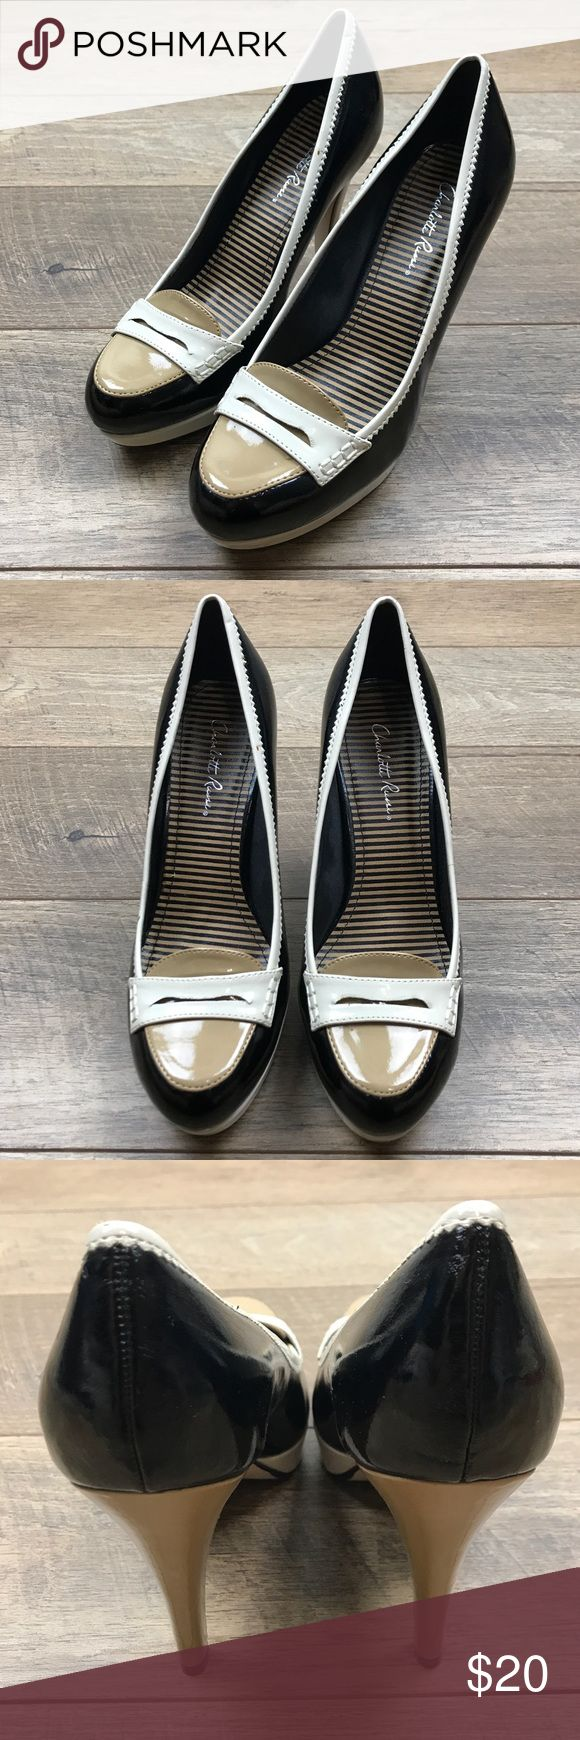 Charlotte Russe 3 Tone Heels Charlotte Russe Heels 3 Tone Heels NWOT. Reference photos listed. Charlotte Russe Shoes Heels